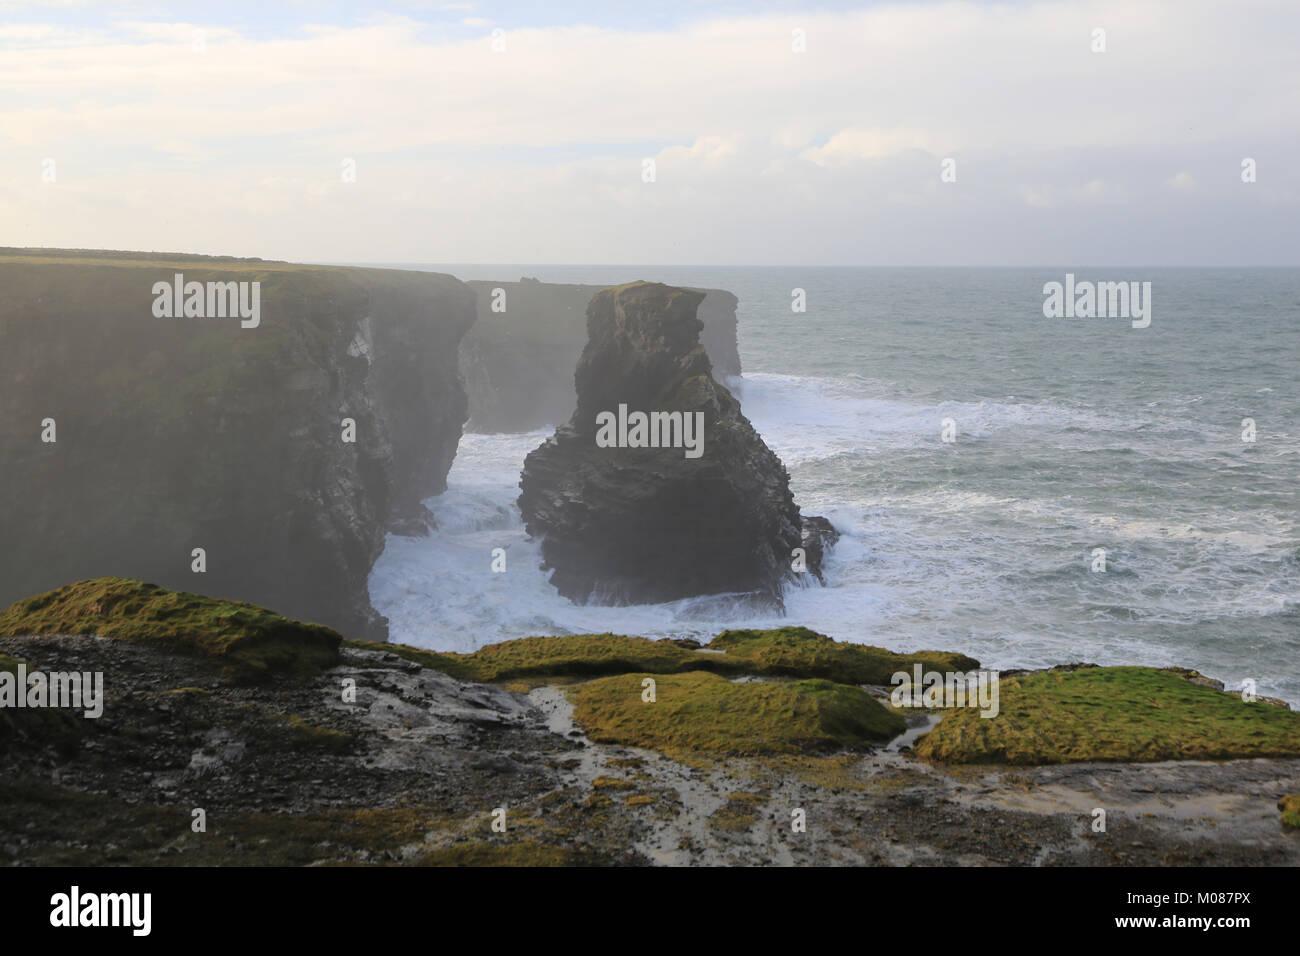 Waves crashing against the rocks and shoreline in Ireland, Wild Atlantic Way - Stock Image